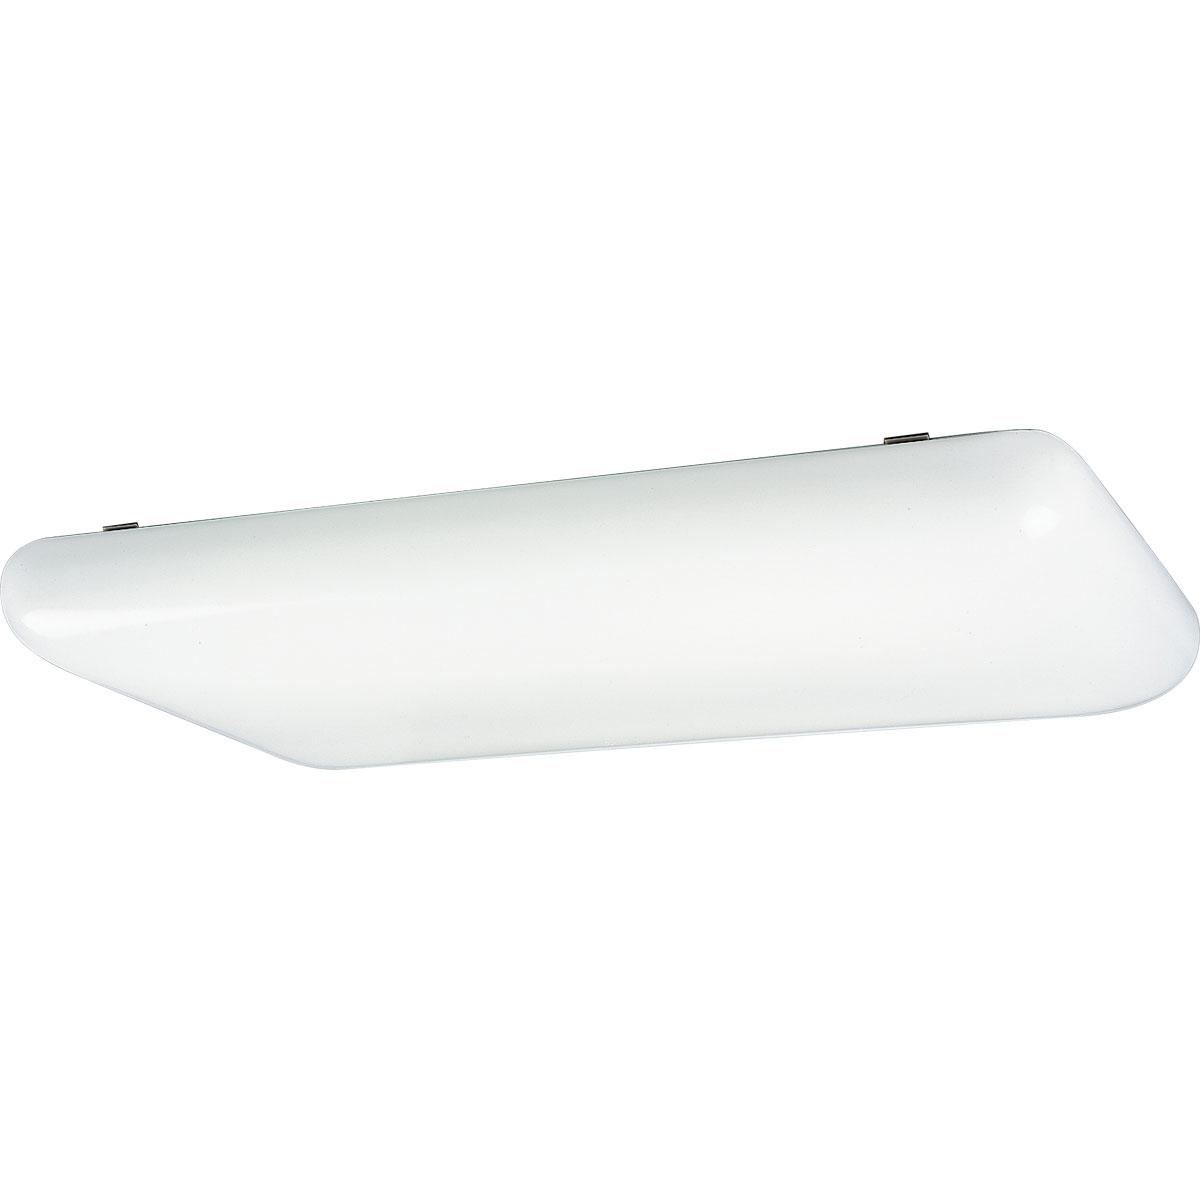 PRO P7280-60EB Four Light White Acrylic Cloud Fluorescent 4XF32T8